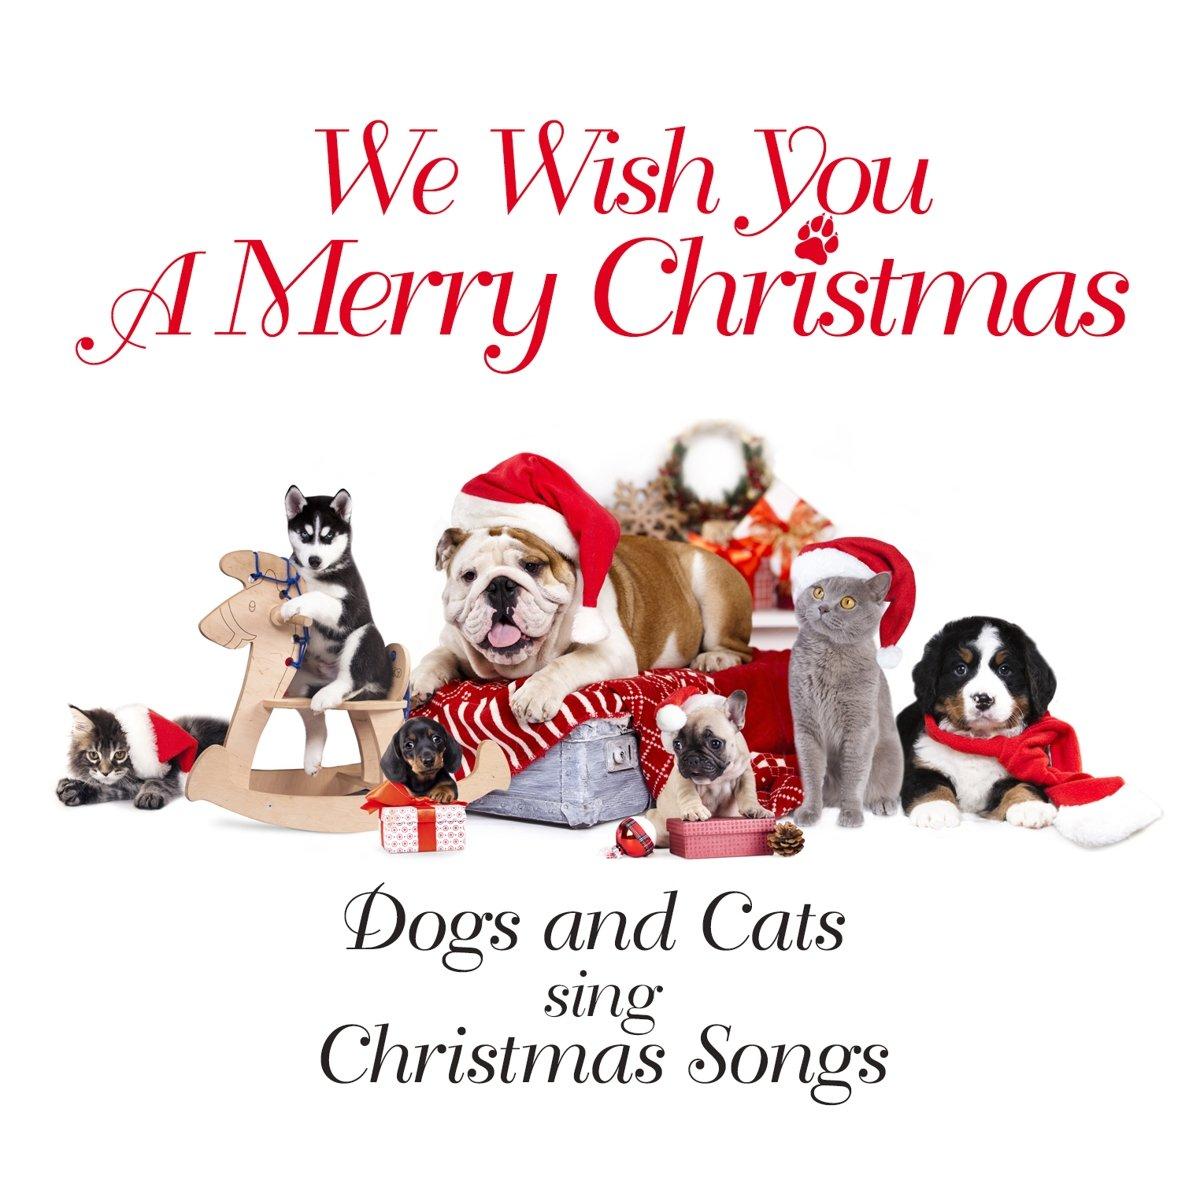 bol.com | We Wish You A Merry Christmas, Dogs & Cats Sing Christmas ...